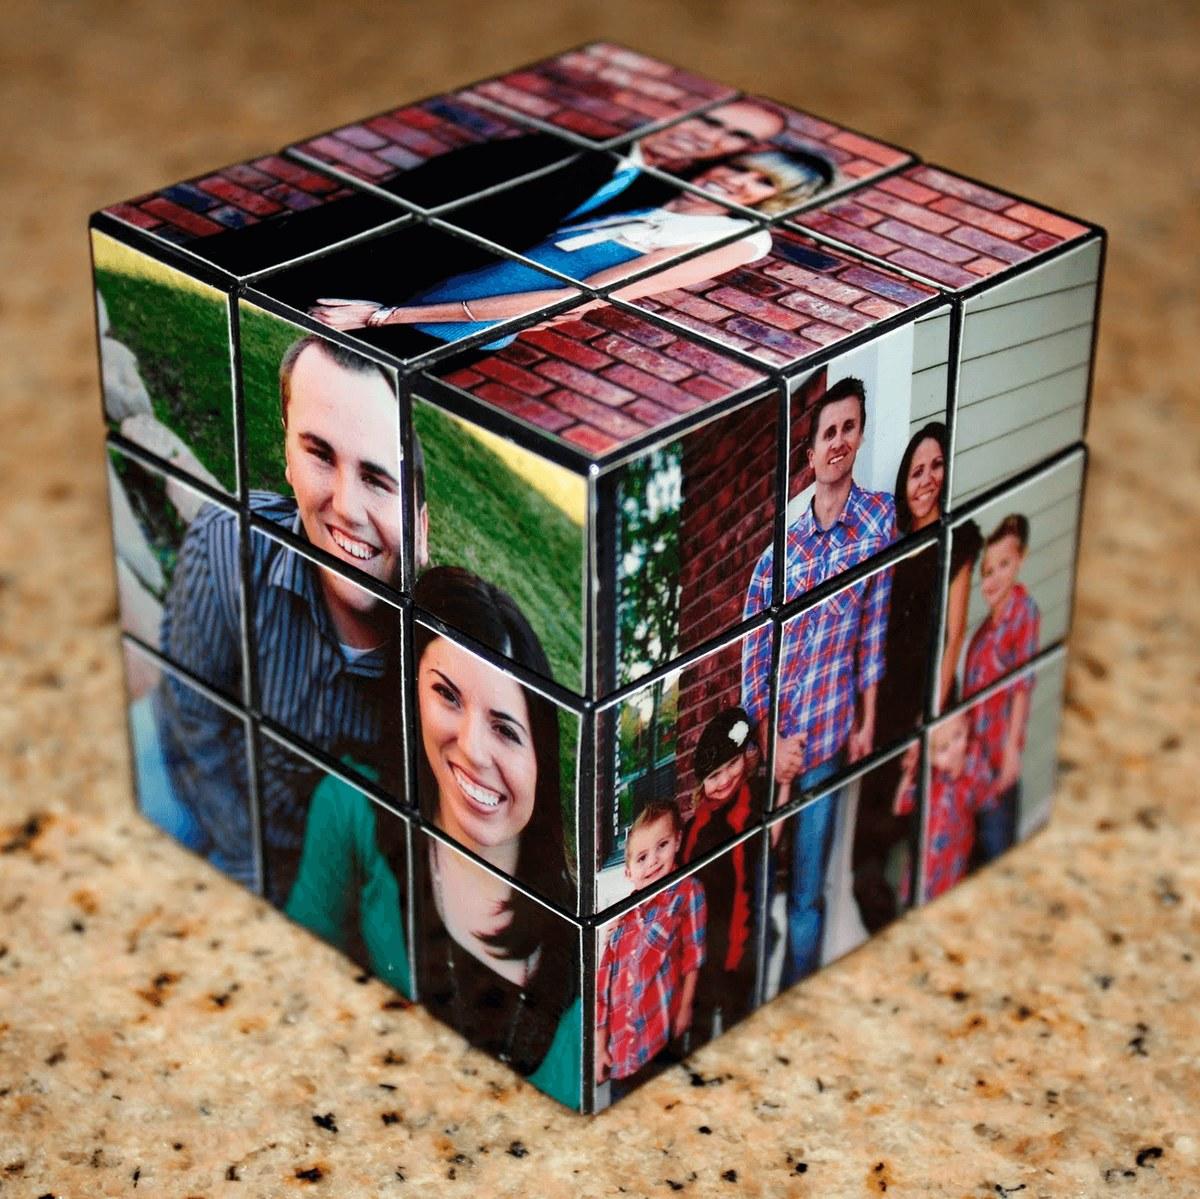 Кубик Рубика ссемейными фотографиями